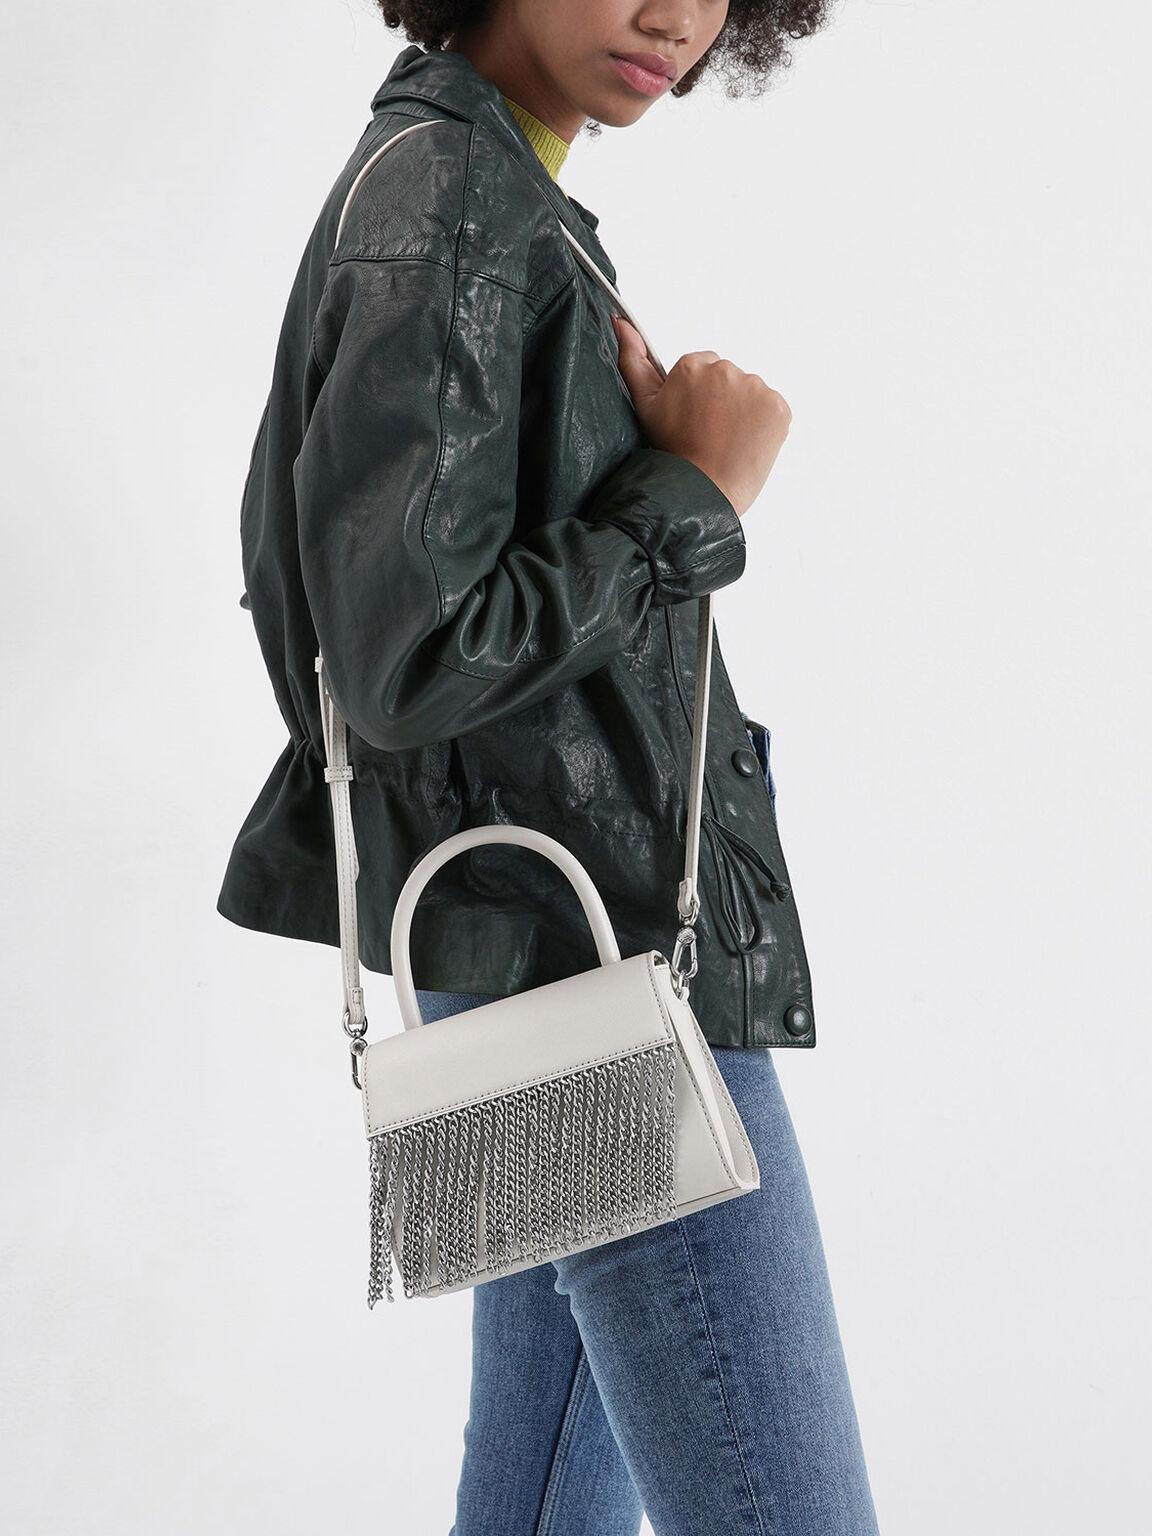 Metallic Fringe Top Handle bag, Cream, hi-res